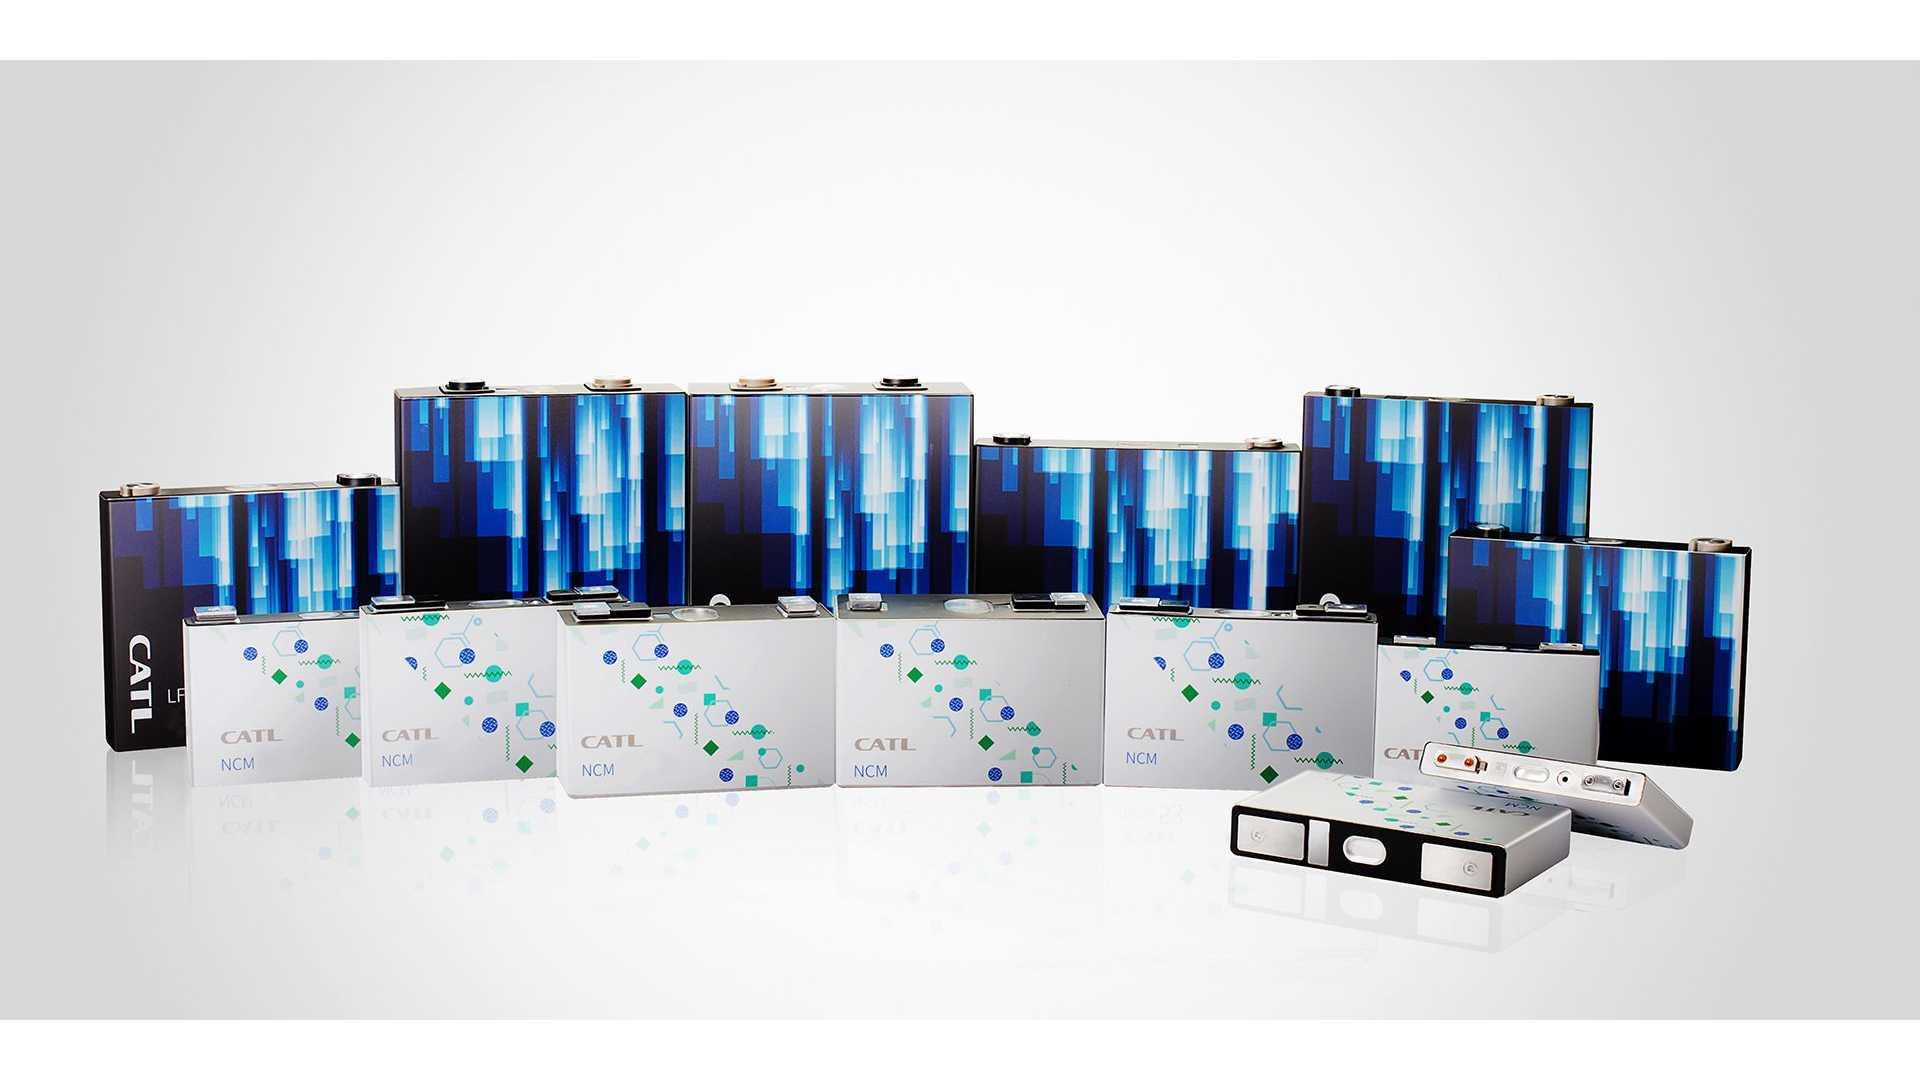 CATL теперь обещает 2-миллионный километр, 16-летняя технология батареи